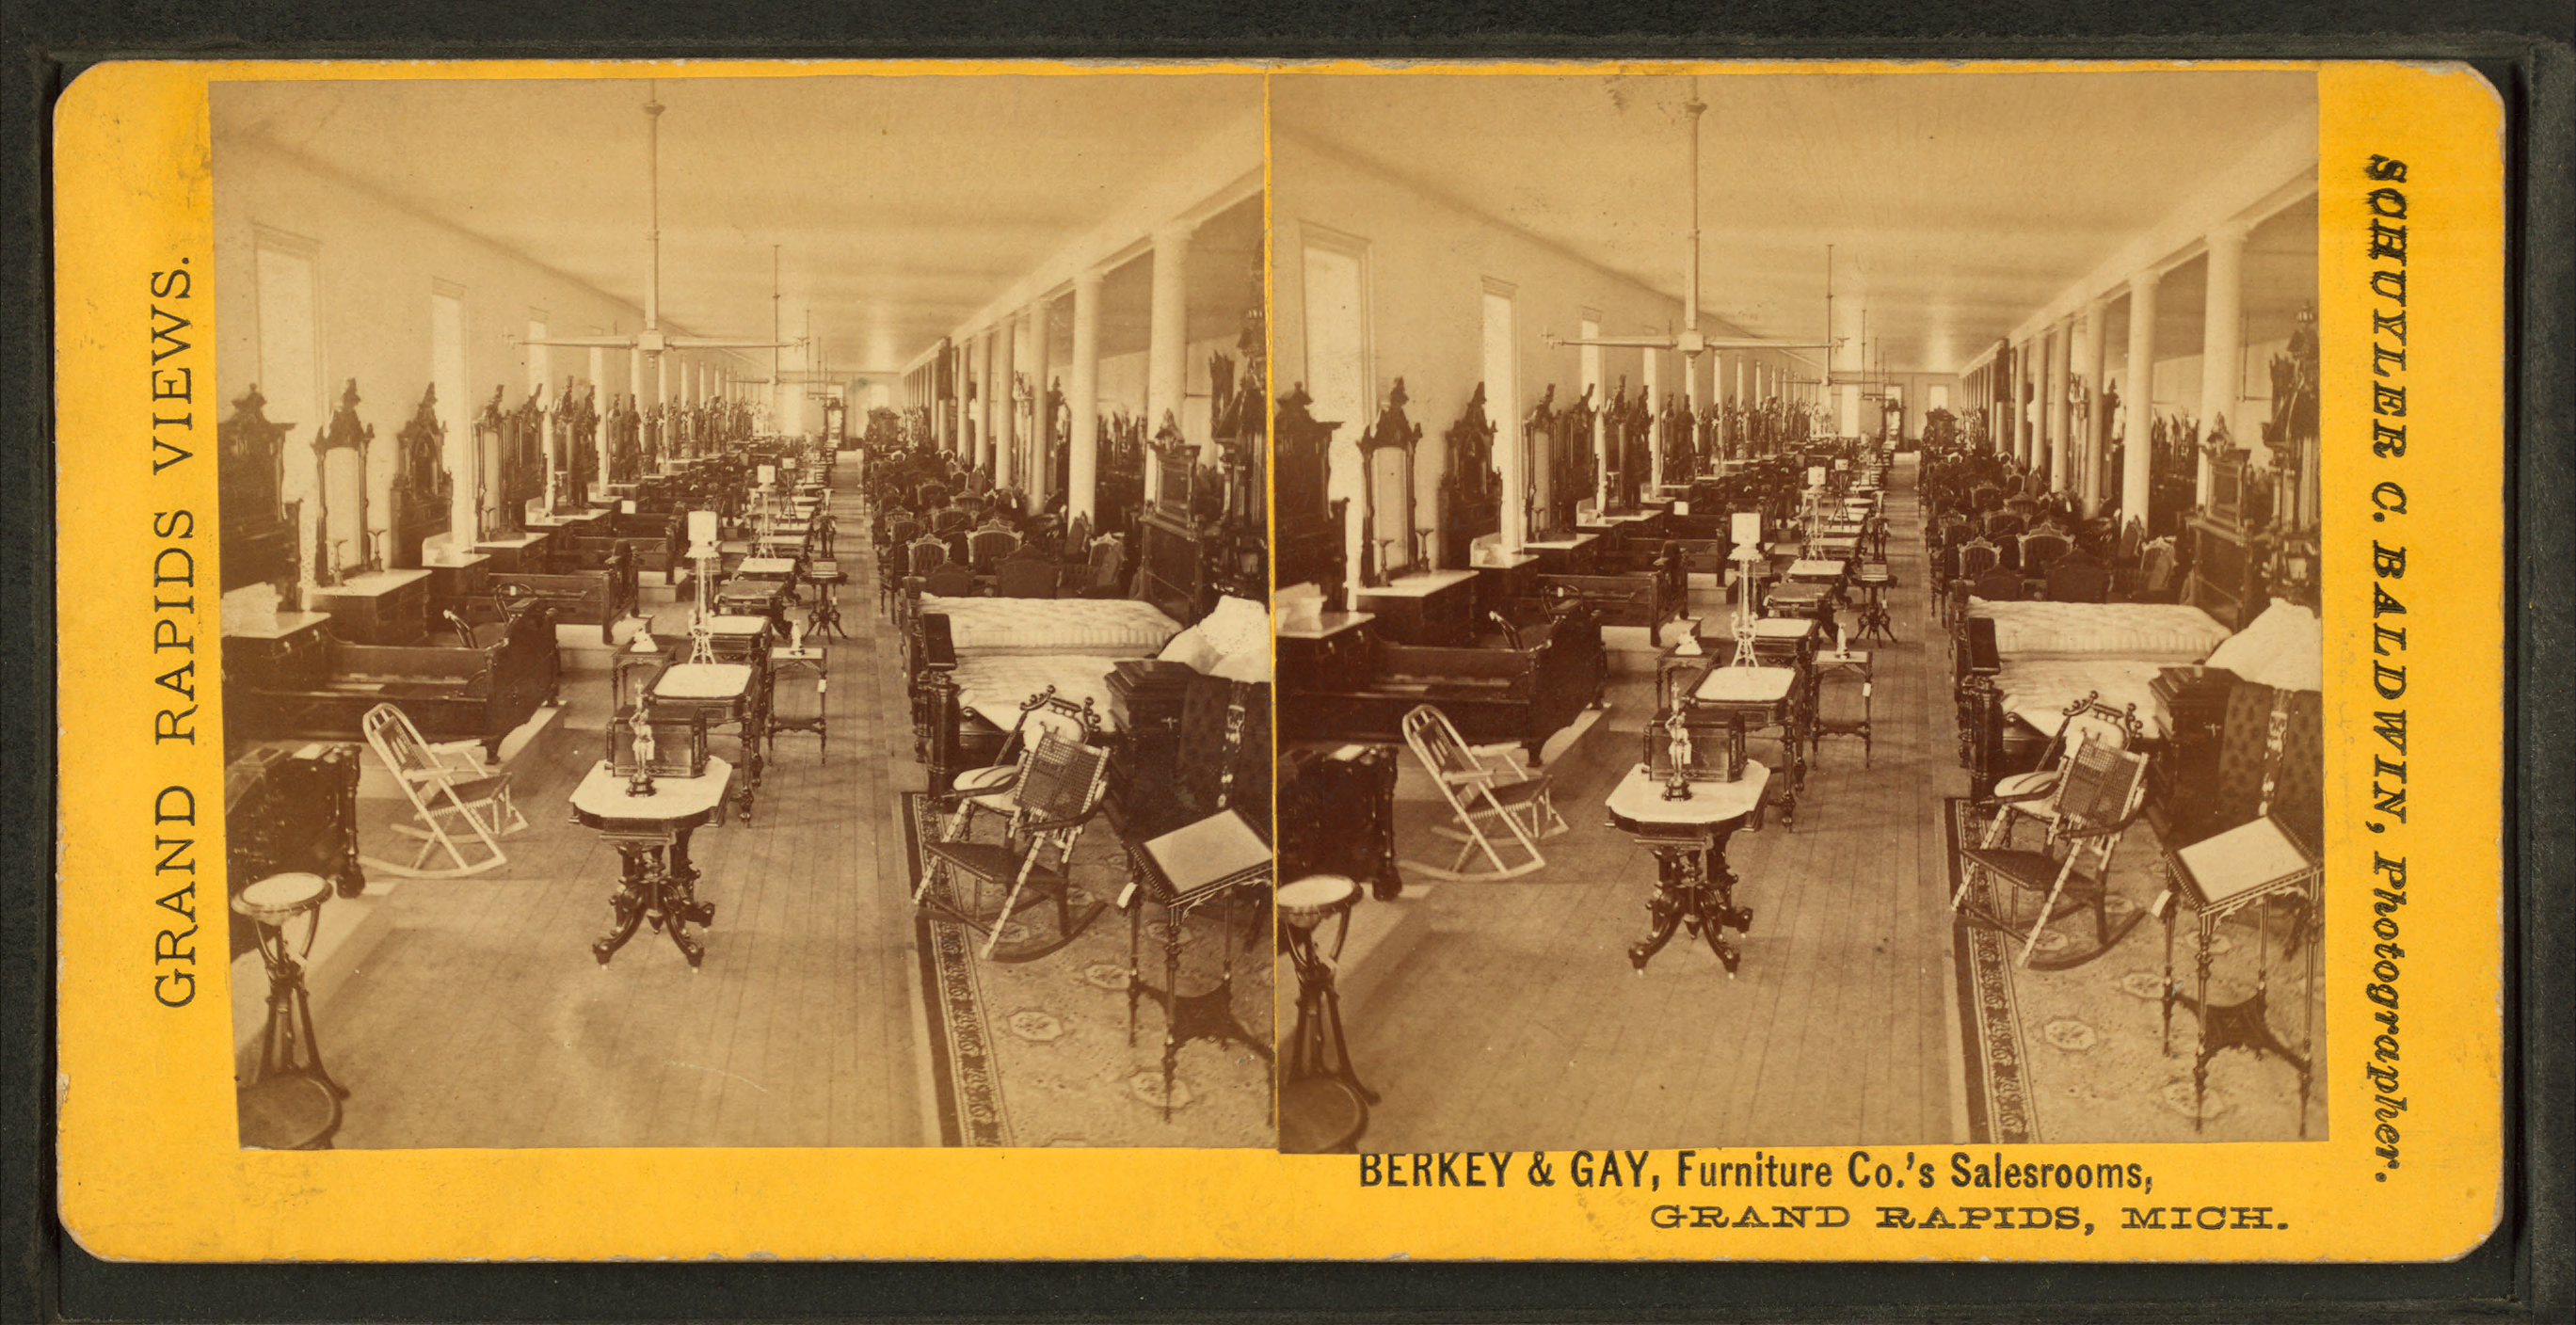 Berkey %26 Gay Furniture Co.s sales rooms, Grand Rapids, Michigan, by Baldwin, Schuyler C. (Schuyler Colfax), 1823 1900 The gay men (pictured) show themselves gardening, in the kitchen, ...